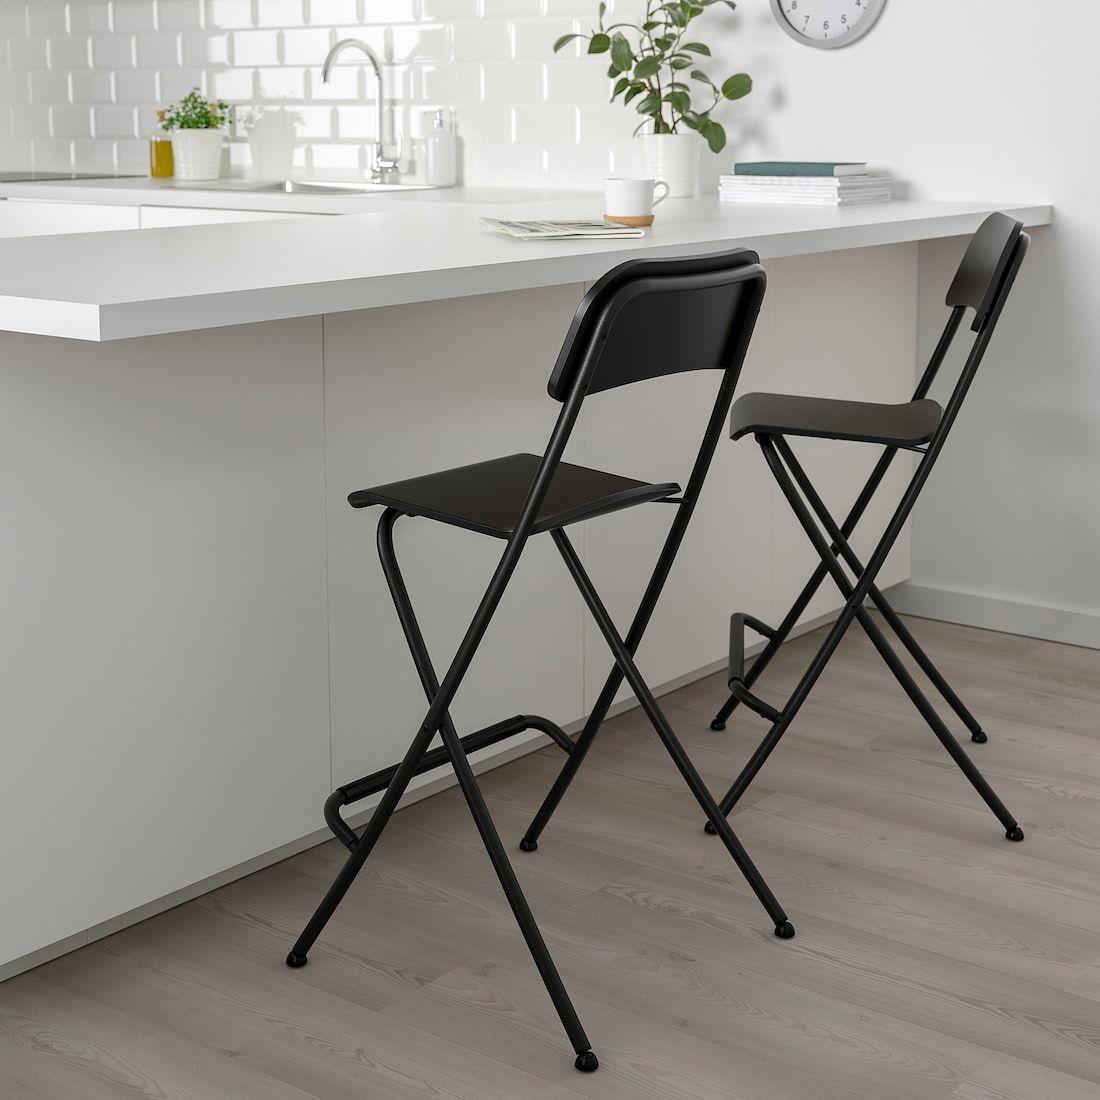 Franklin Bar Stool With Backrest Foldable Black Black Width 19 5 8 Find It Here Ikea In 2020 Foldable Bar Stools Folding Bar Stools Bar Stools